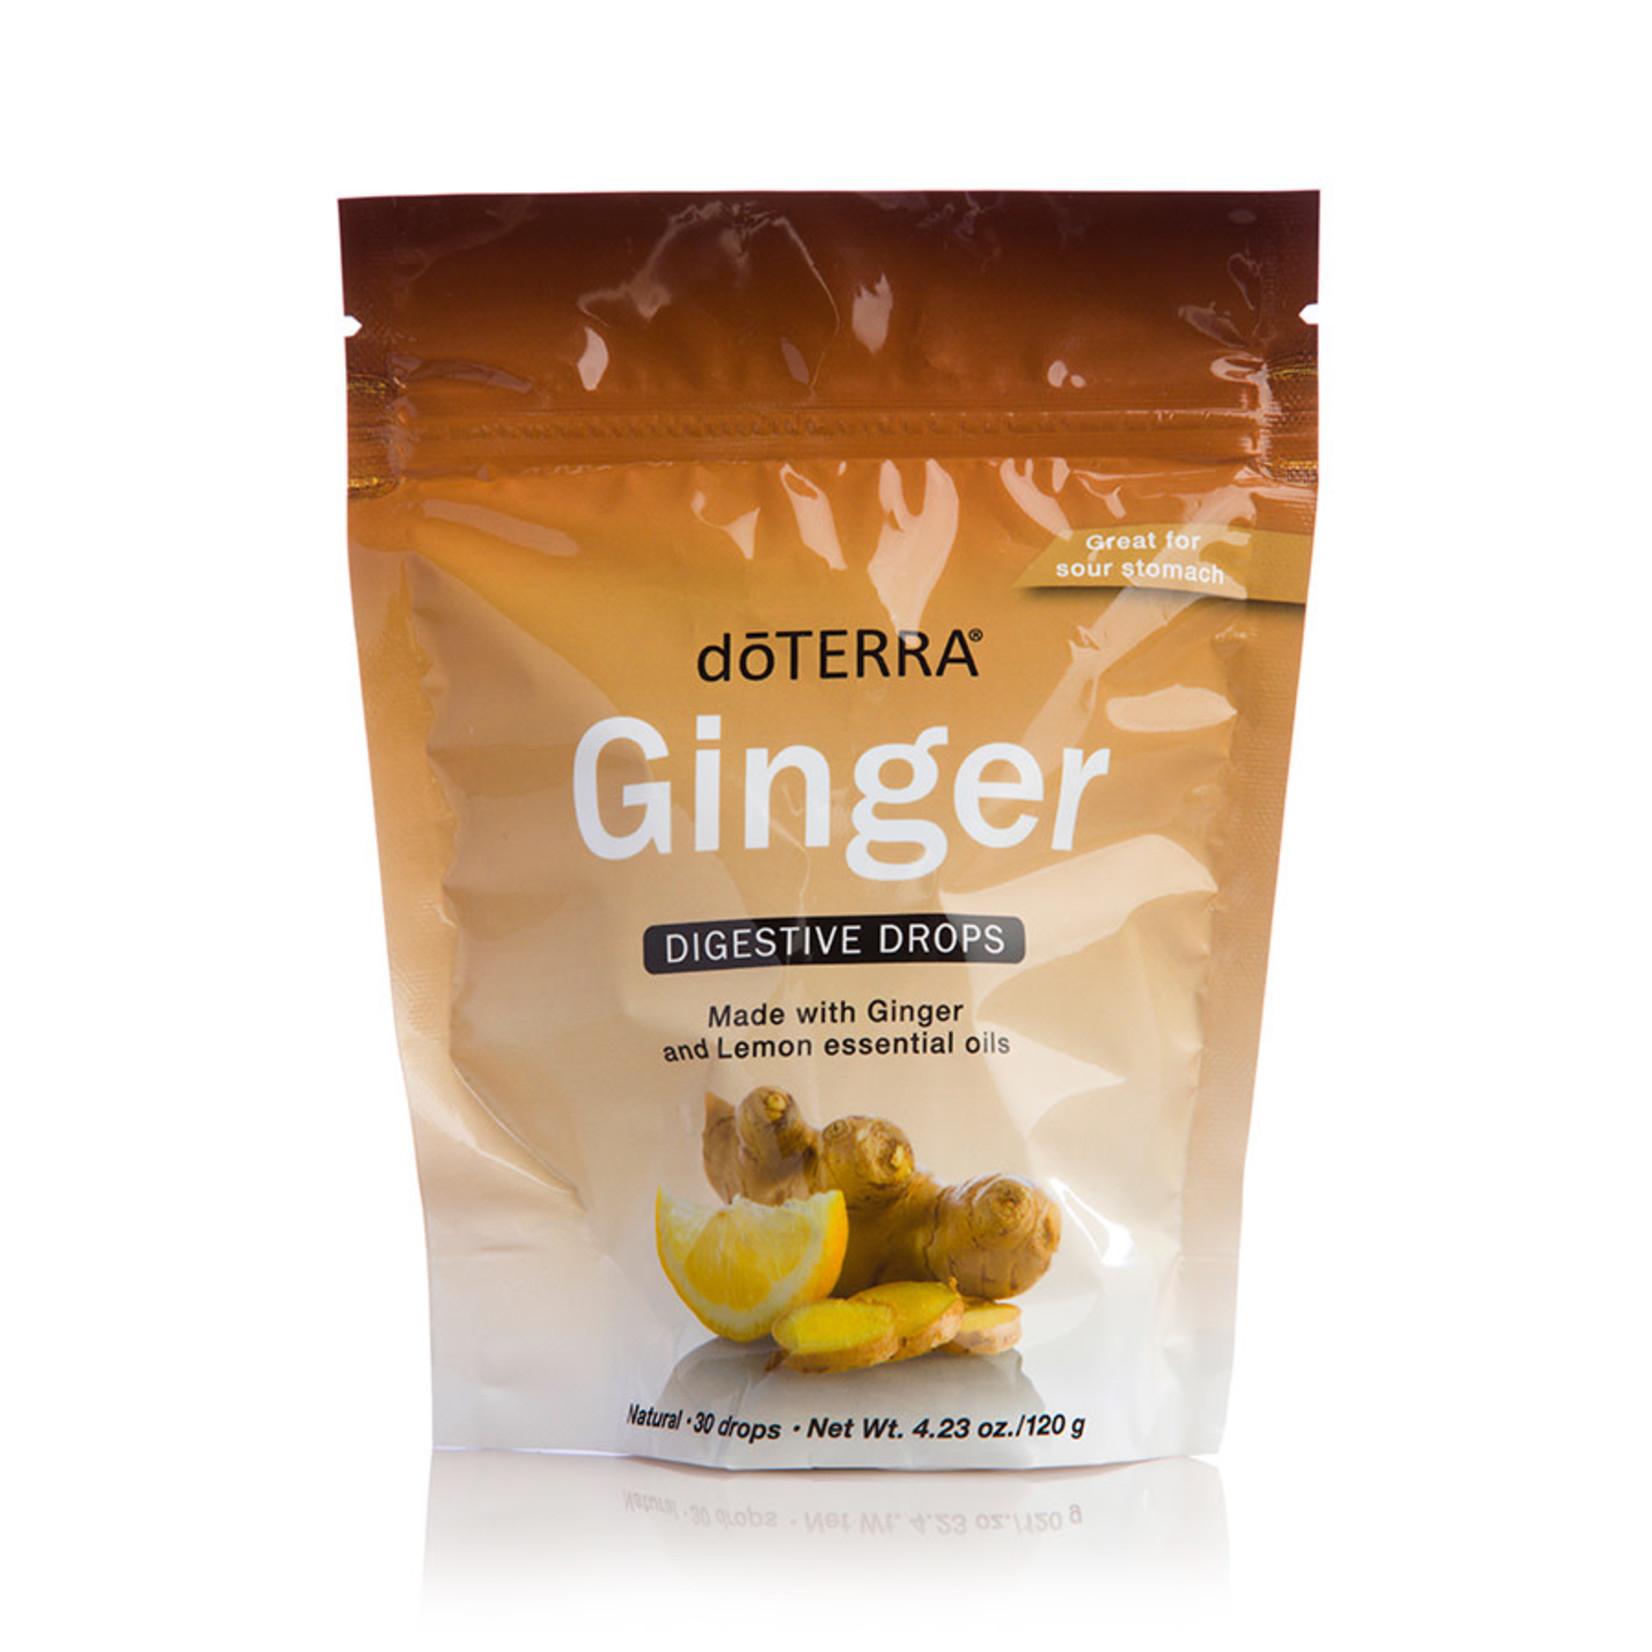 doTERRA doTerra Ginger Digestive Drops 30 drops